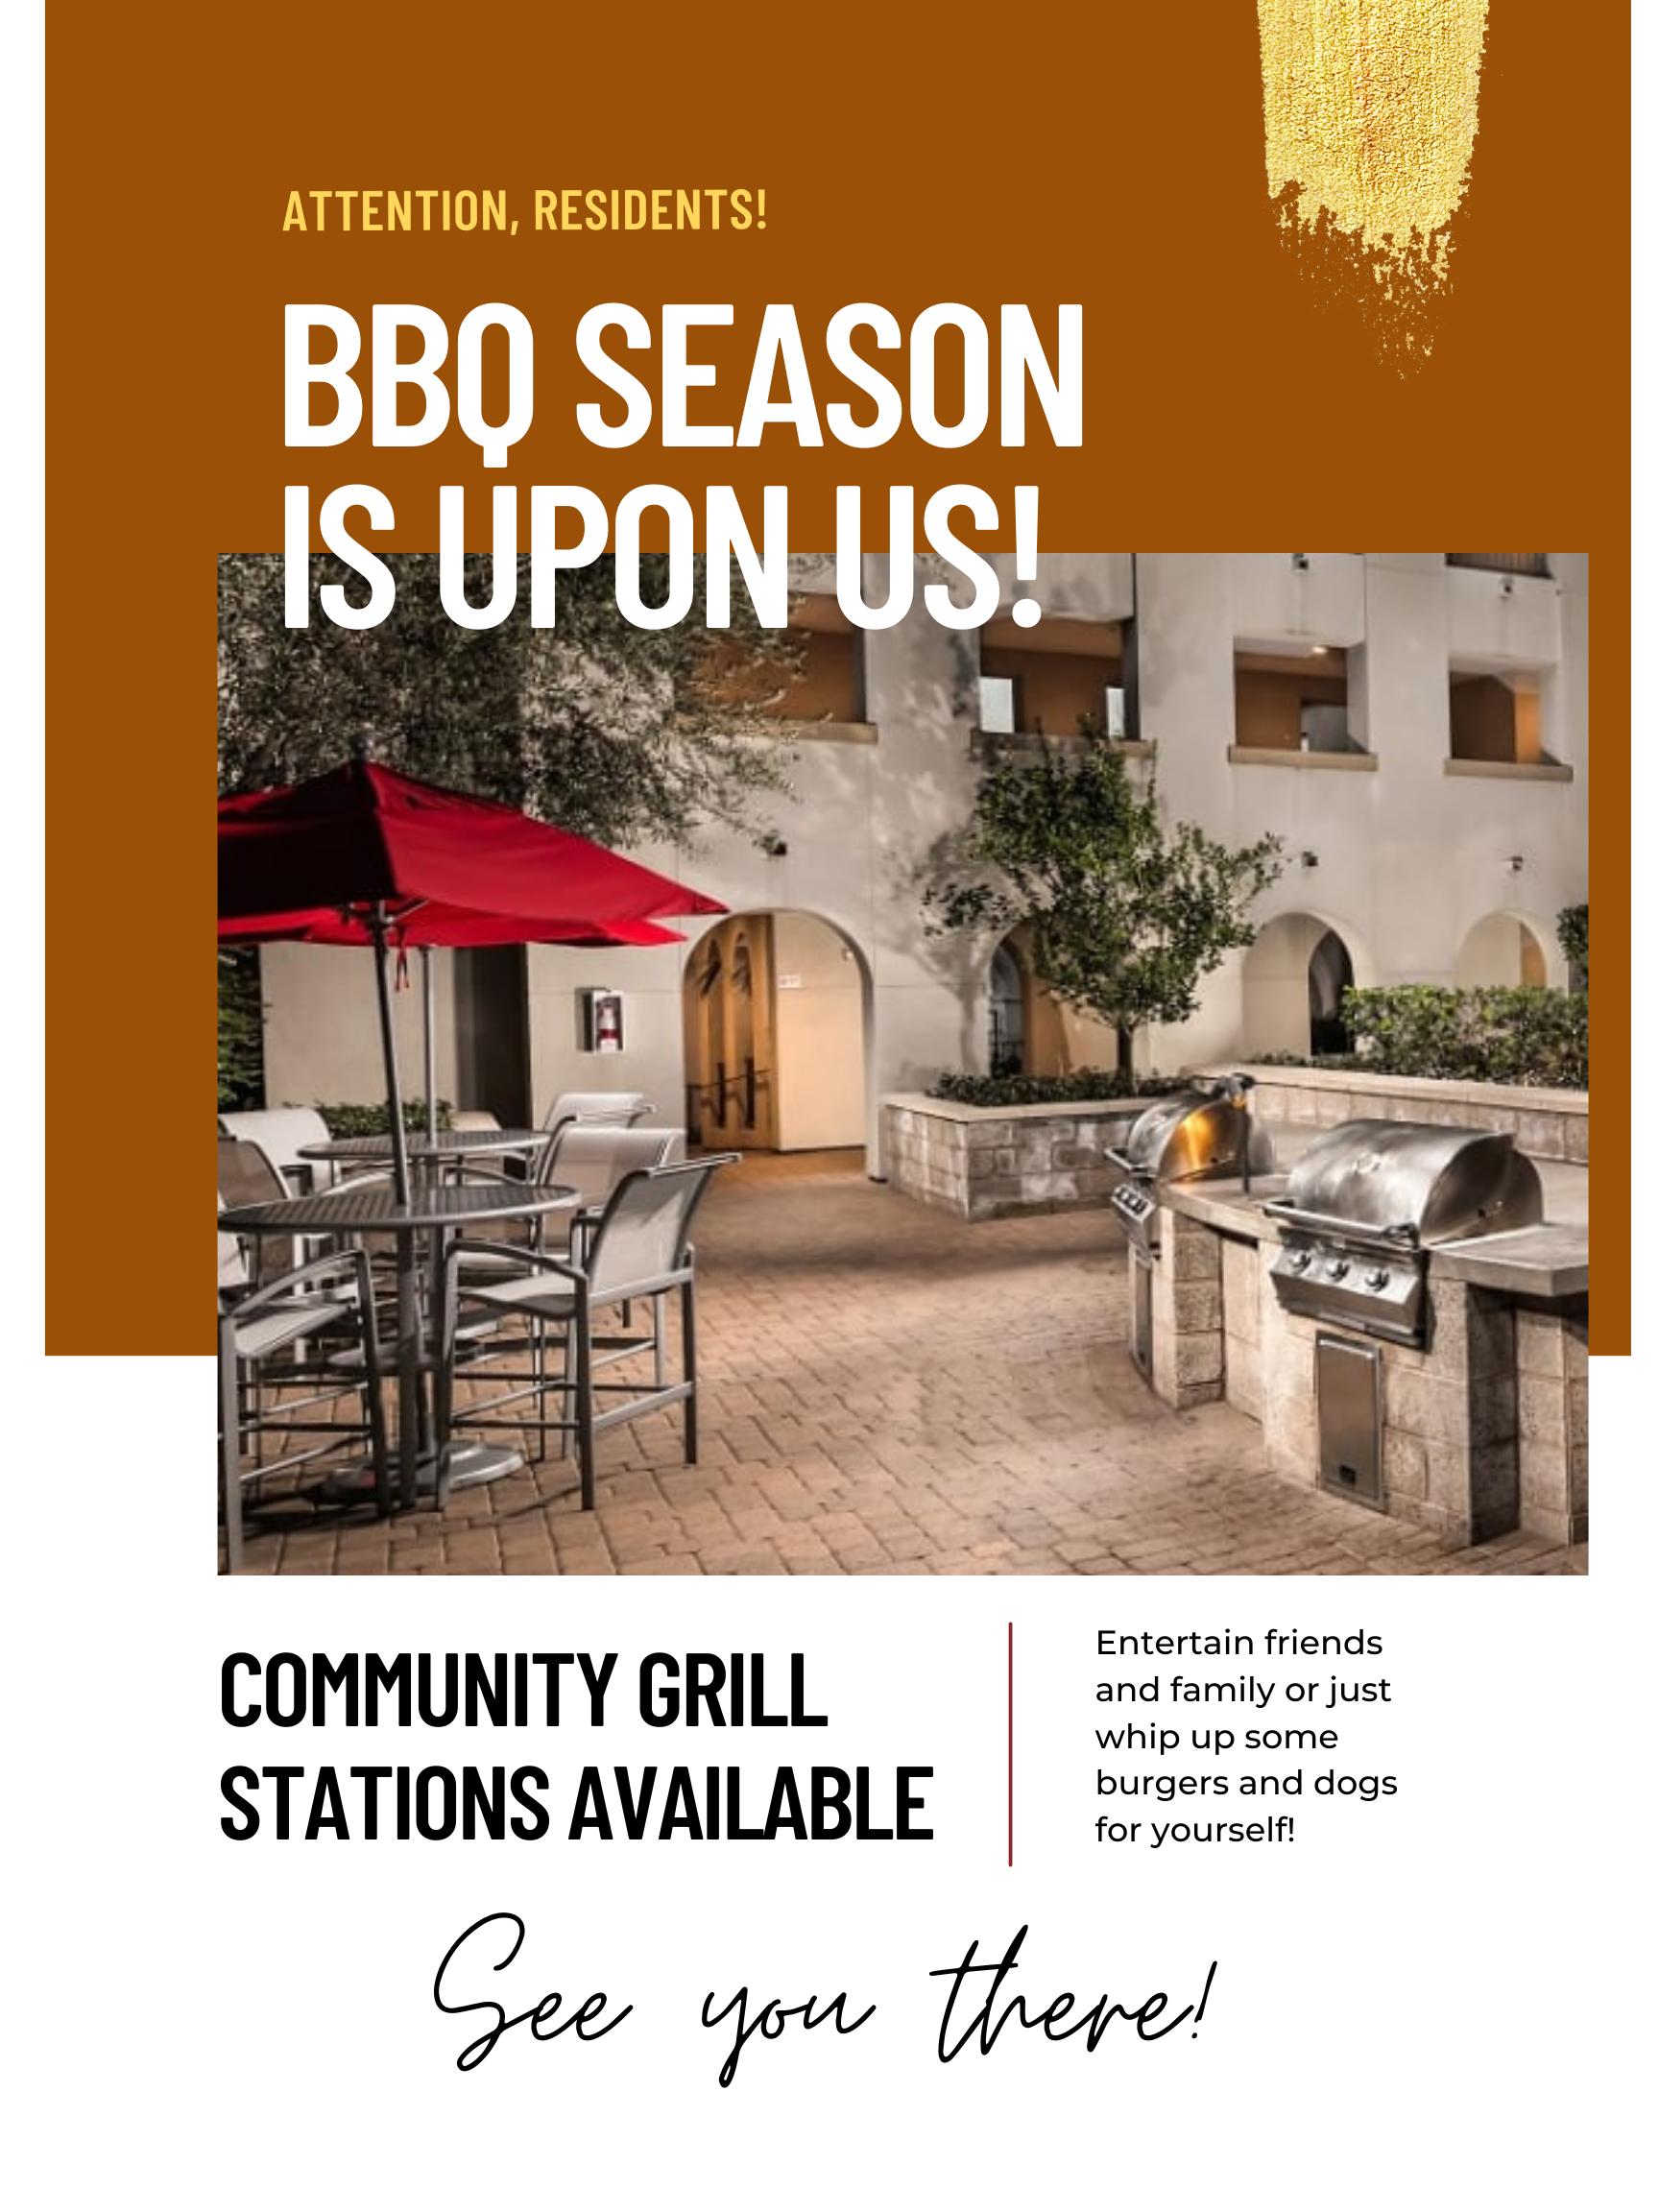 bbq season flyer for residents at Trio apartments Pasadena, CA